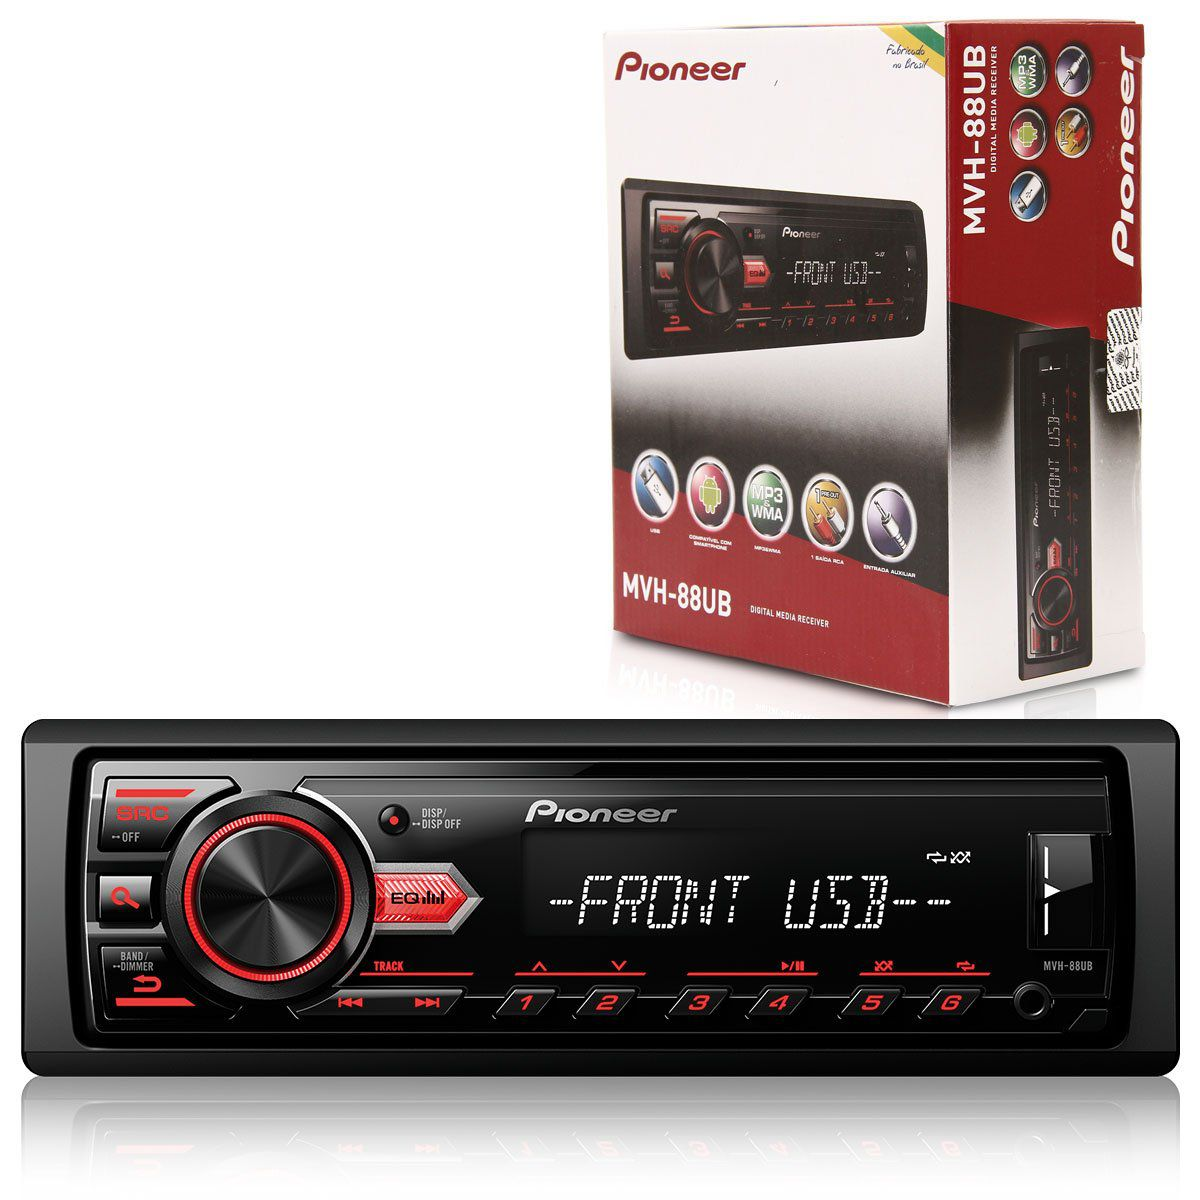 Auto Radio Pioneer Mp3 Usb Am Fm